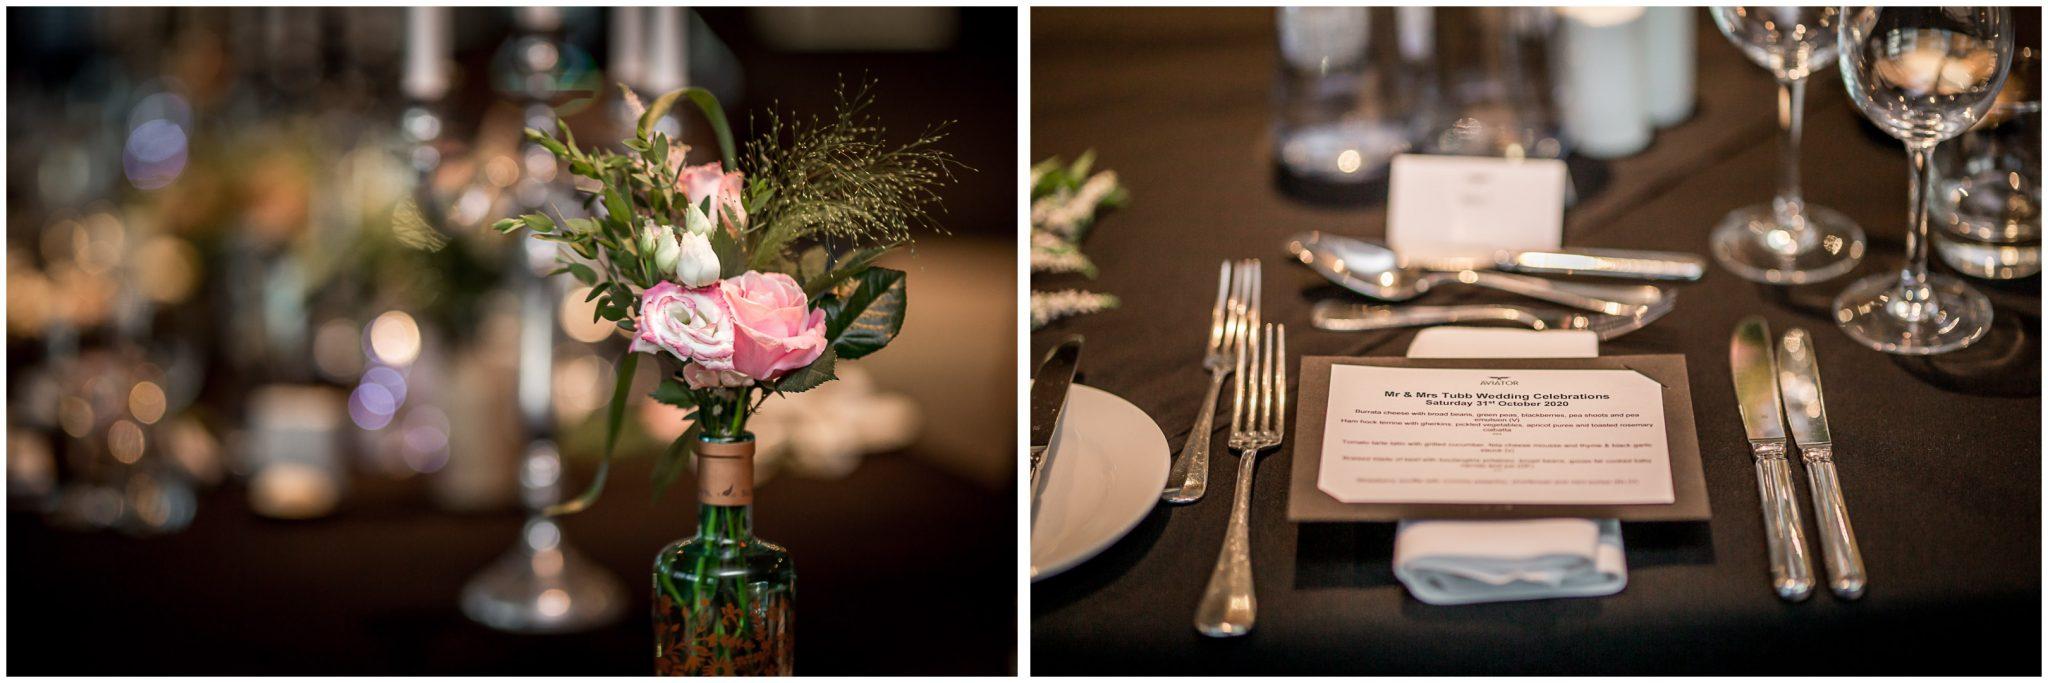 Table settings in Sky Bar